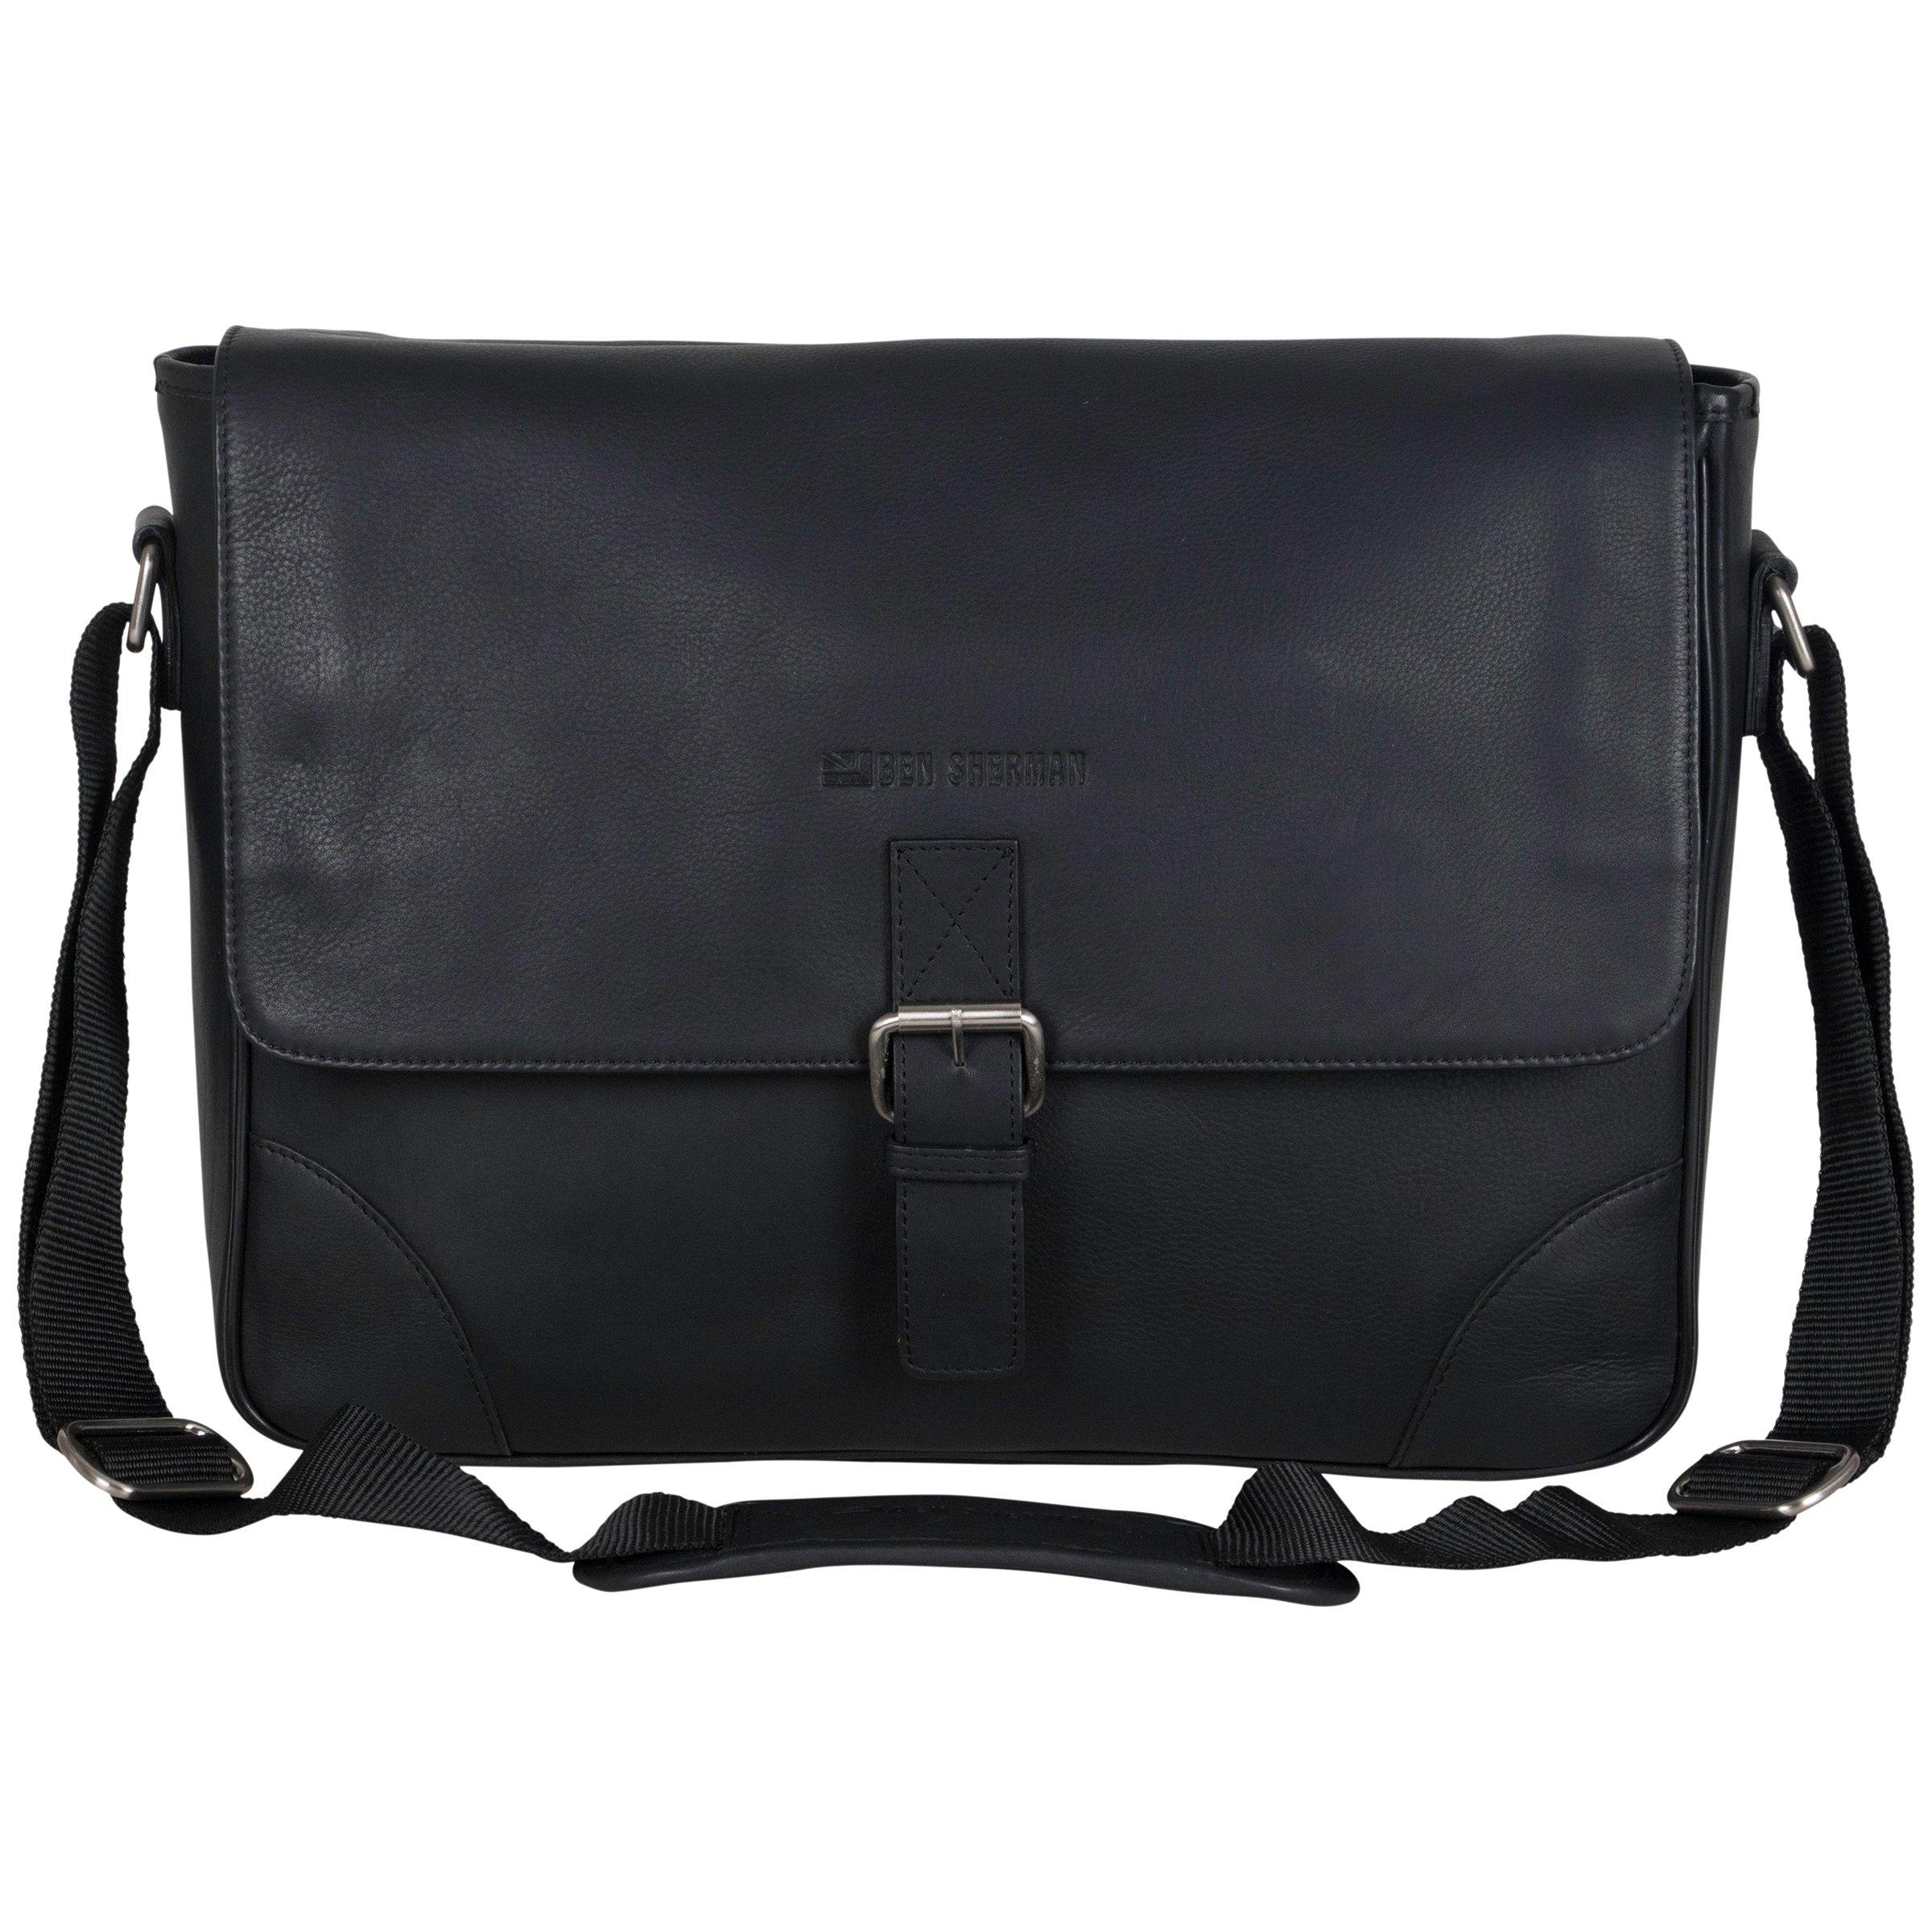 Ben Sherman Leather Single Compartment 15'' Laptop Messenger Bag (RFID), Black